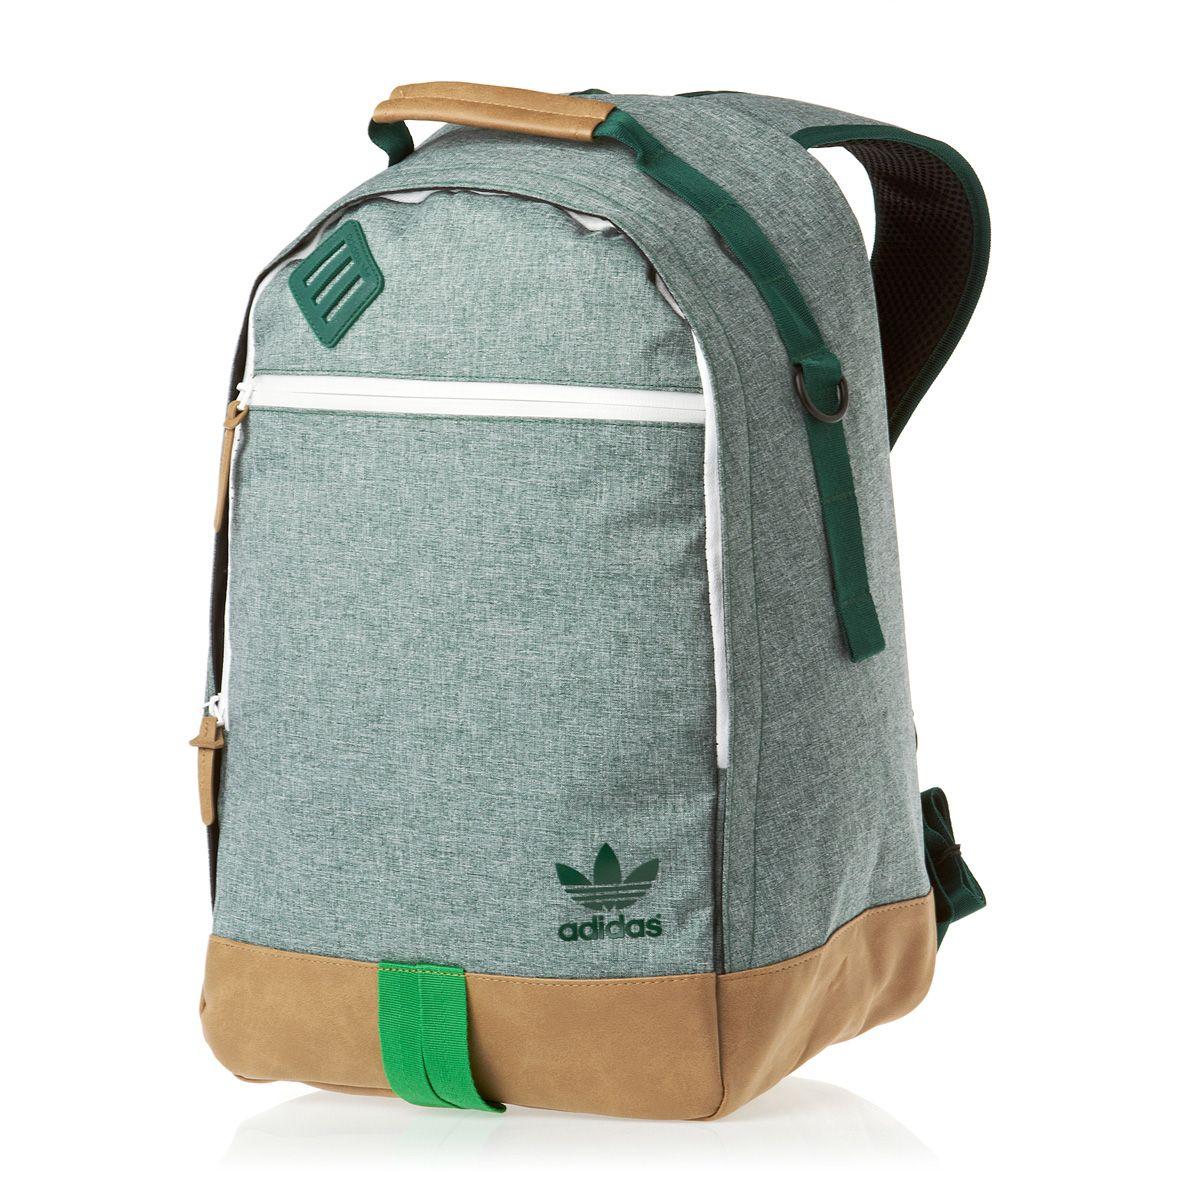 19daa15879cf Adidas Originals Backpack Blue And White